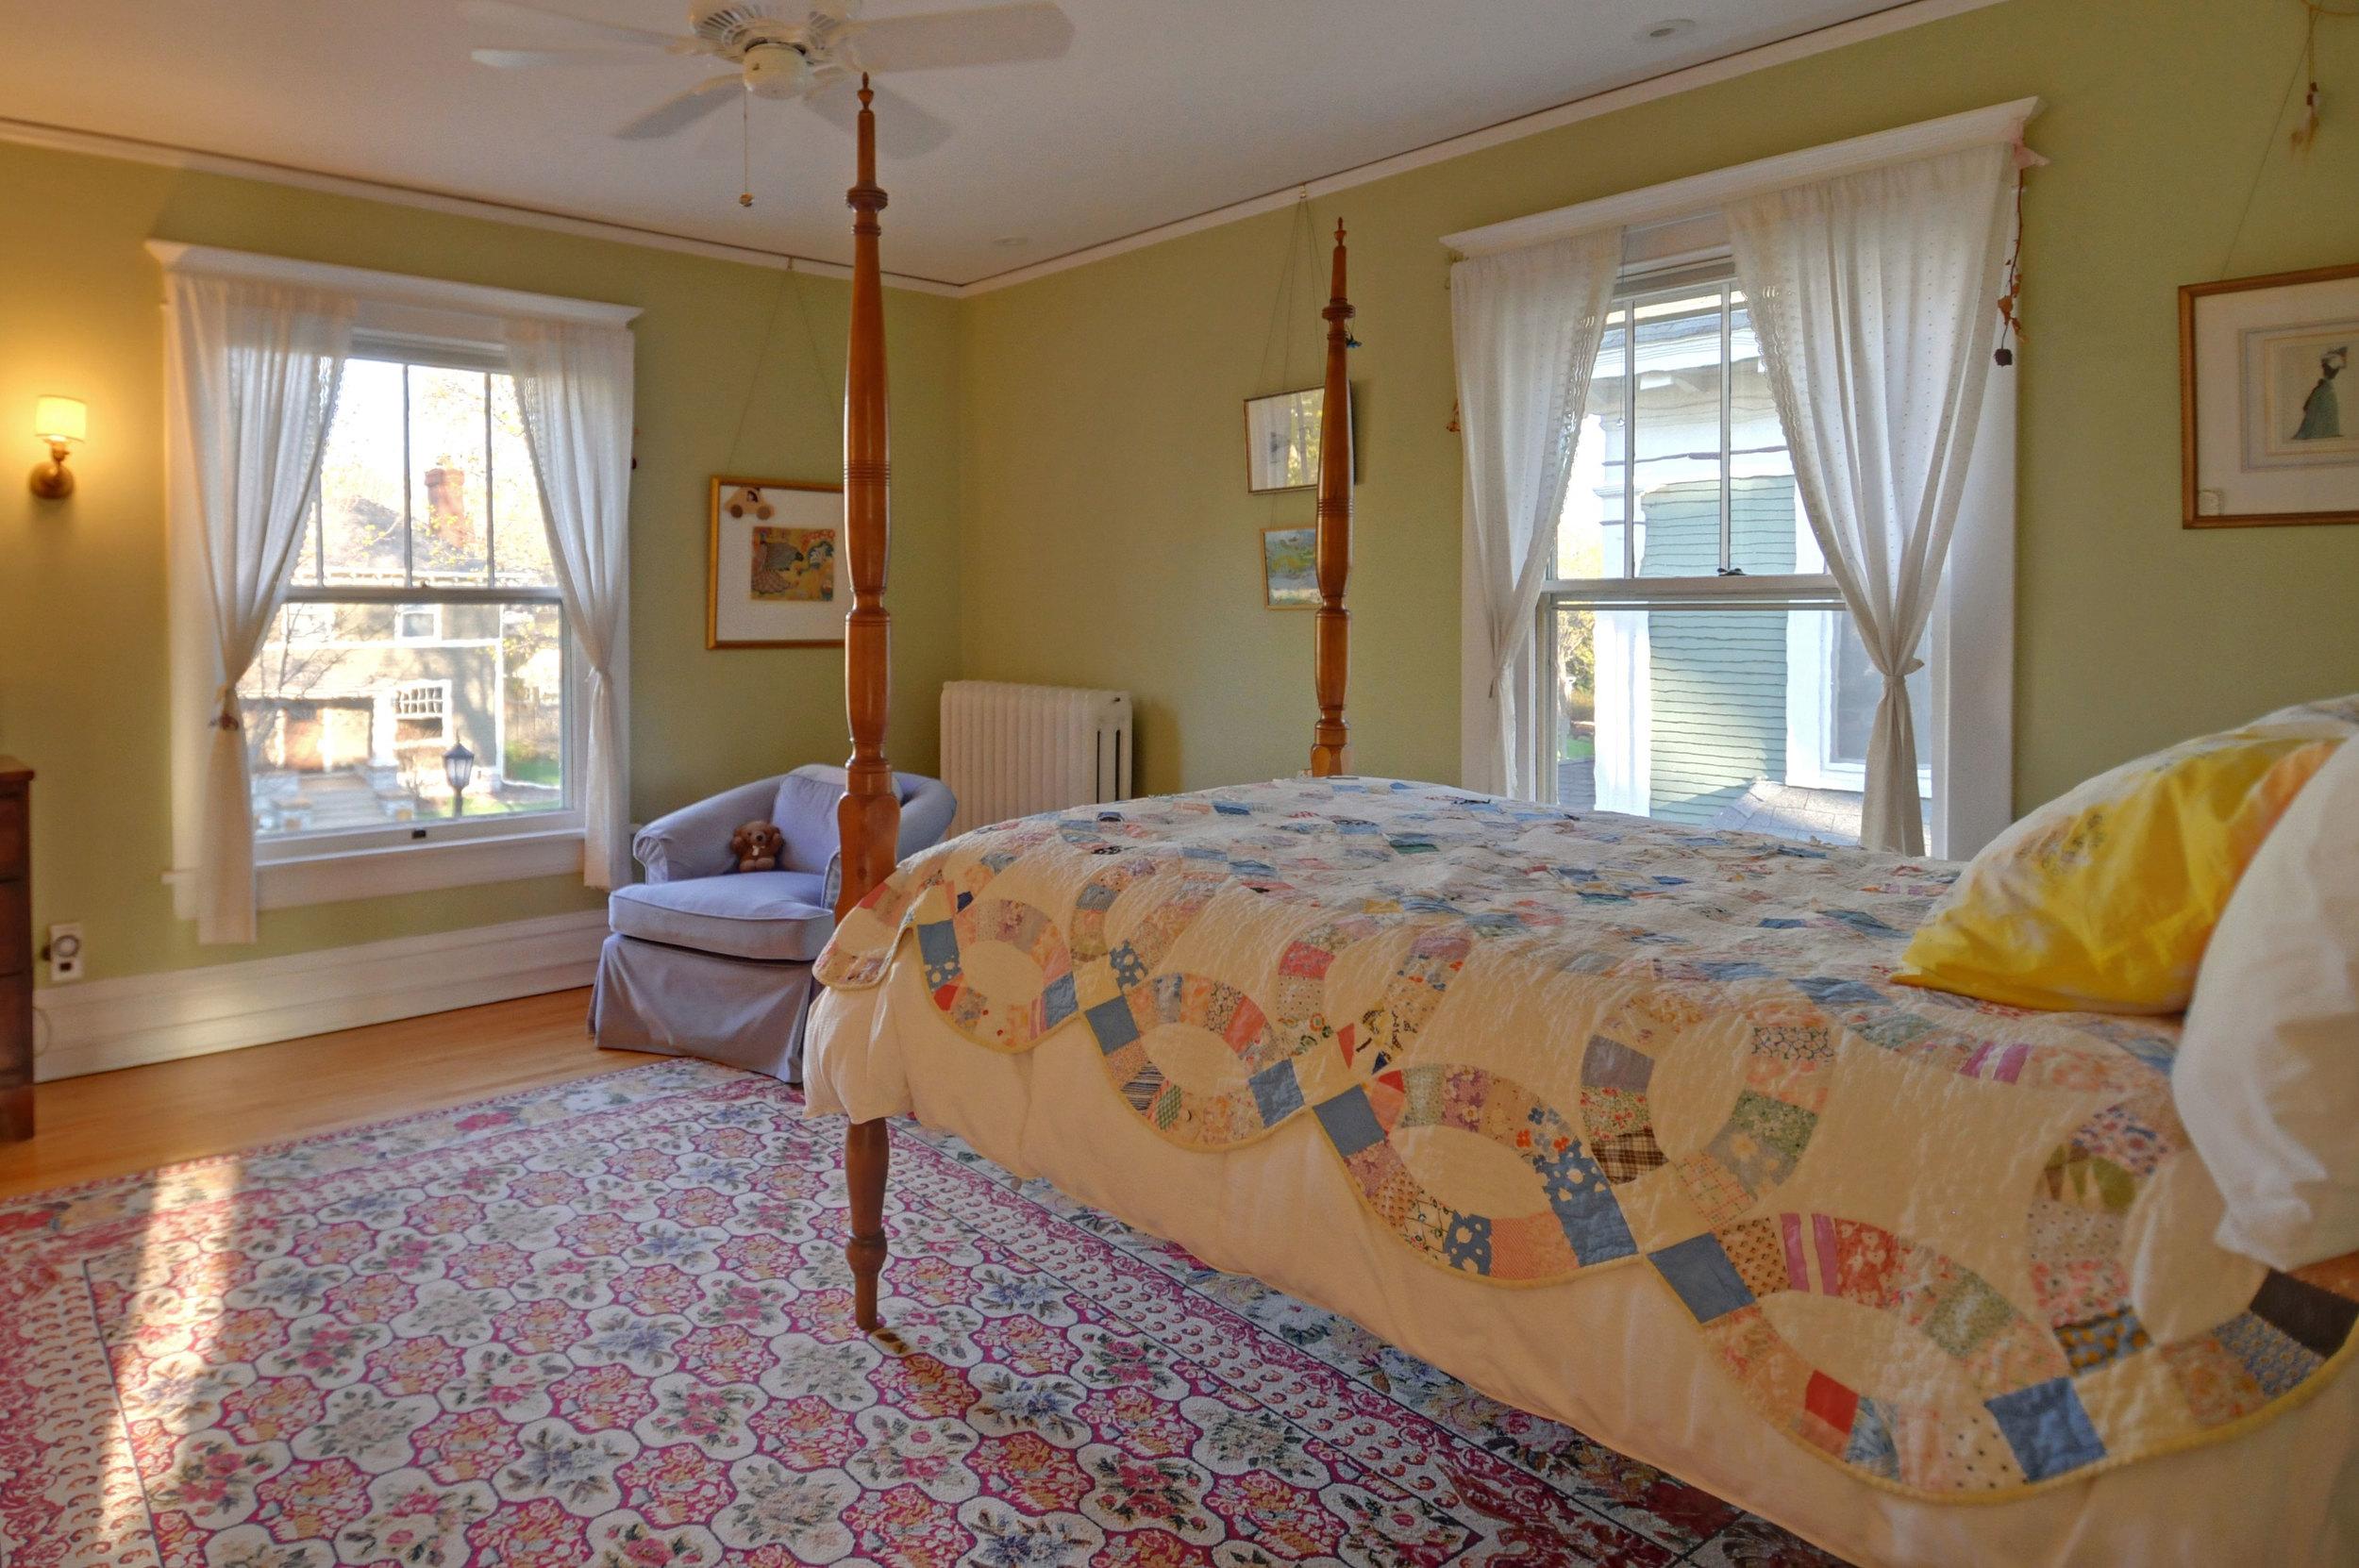 2424-bedroom-2.jpg